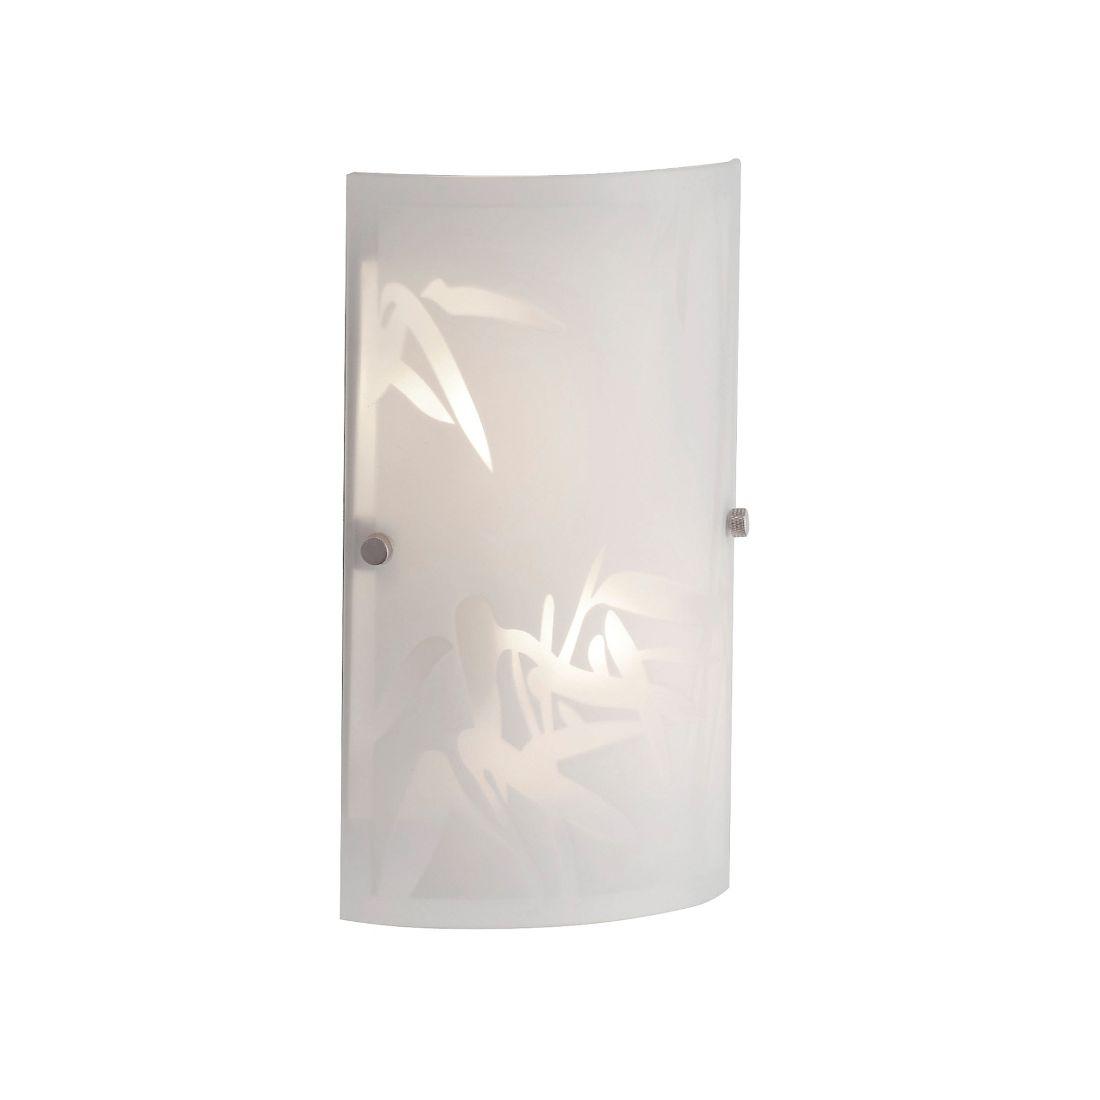 wandleuchte wandlampe lampe flur diele wohnzimmer wei floral glas metall neu ebay. Black Bedroom Furniture Sets. Home Design Ideas